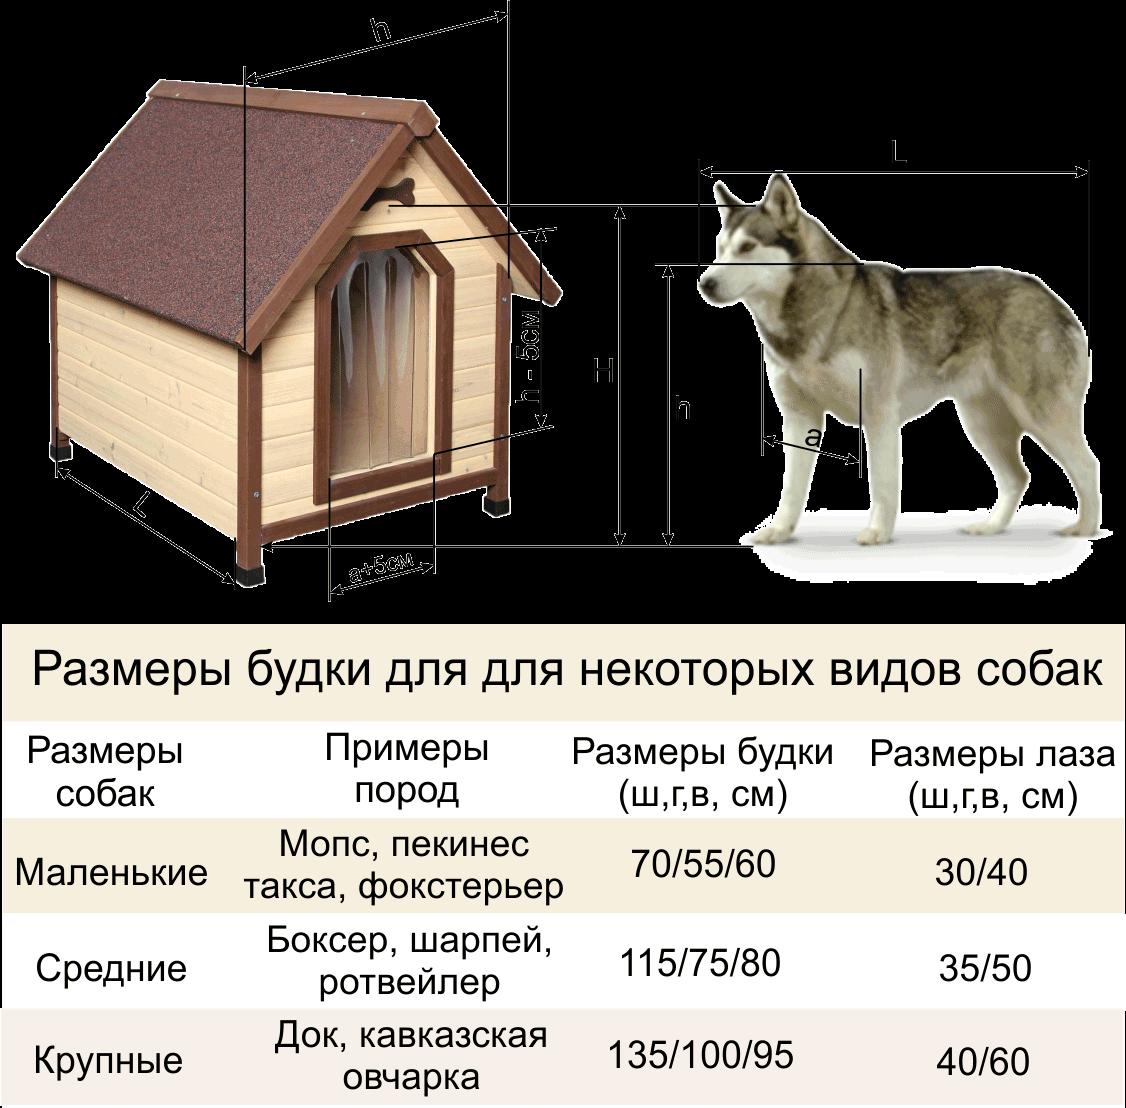 Собачьи будки своими руками фото чертежи